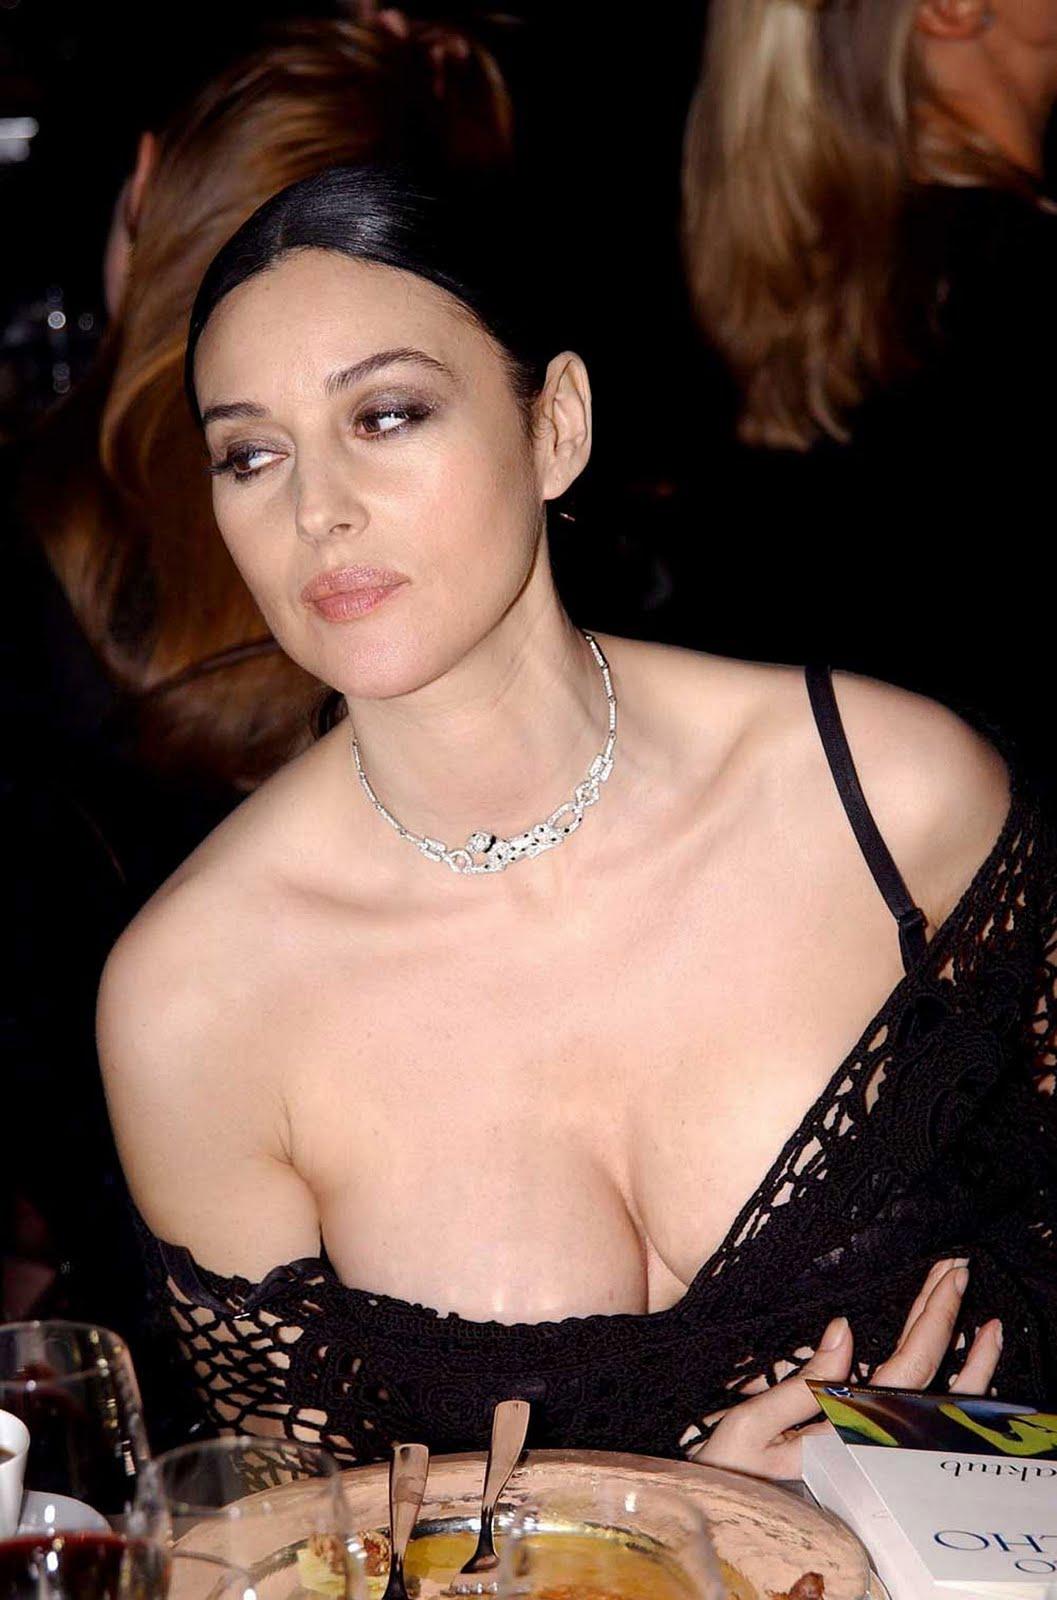 Monica bellucci nude videos photos 284